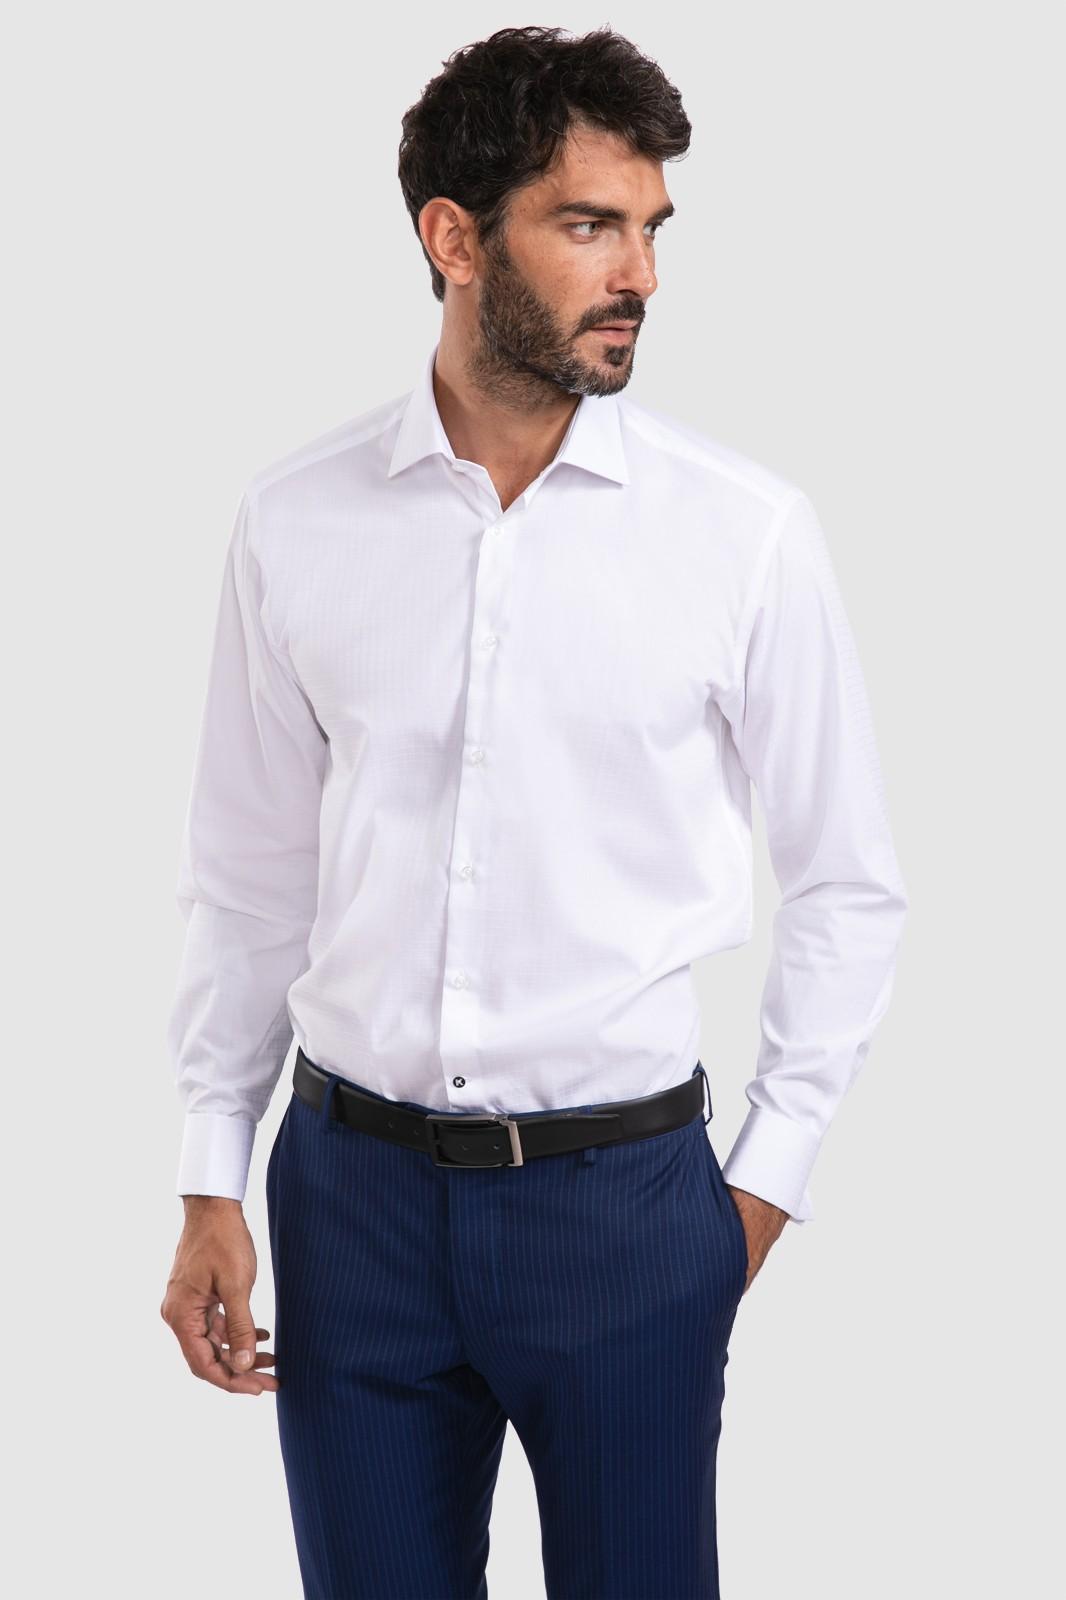 Рубашка мужская Kanzler 20W-SBL12RLSZ/01-1 белая 52-54 RU